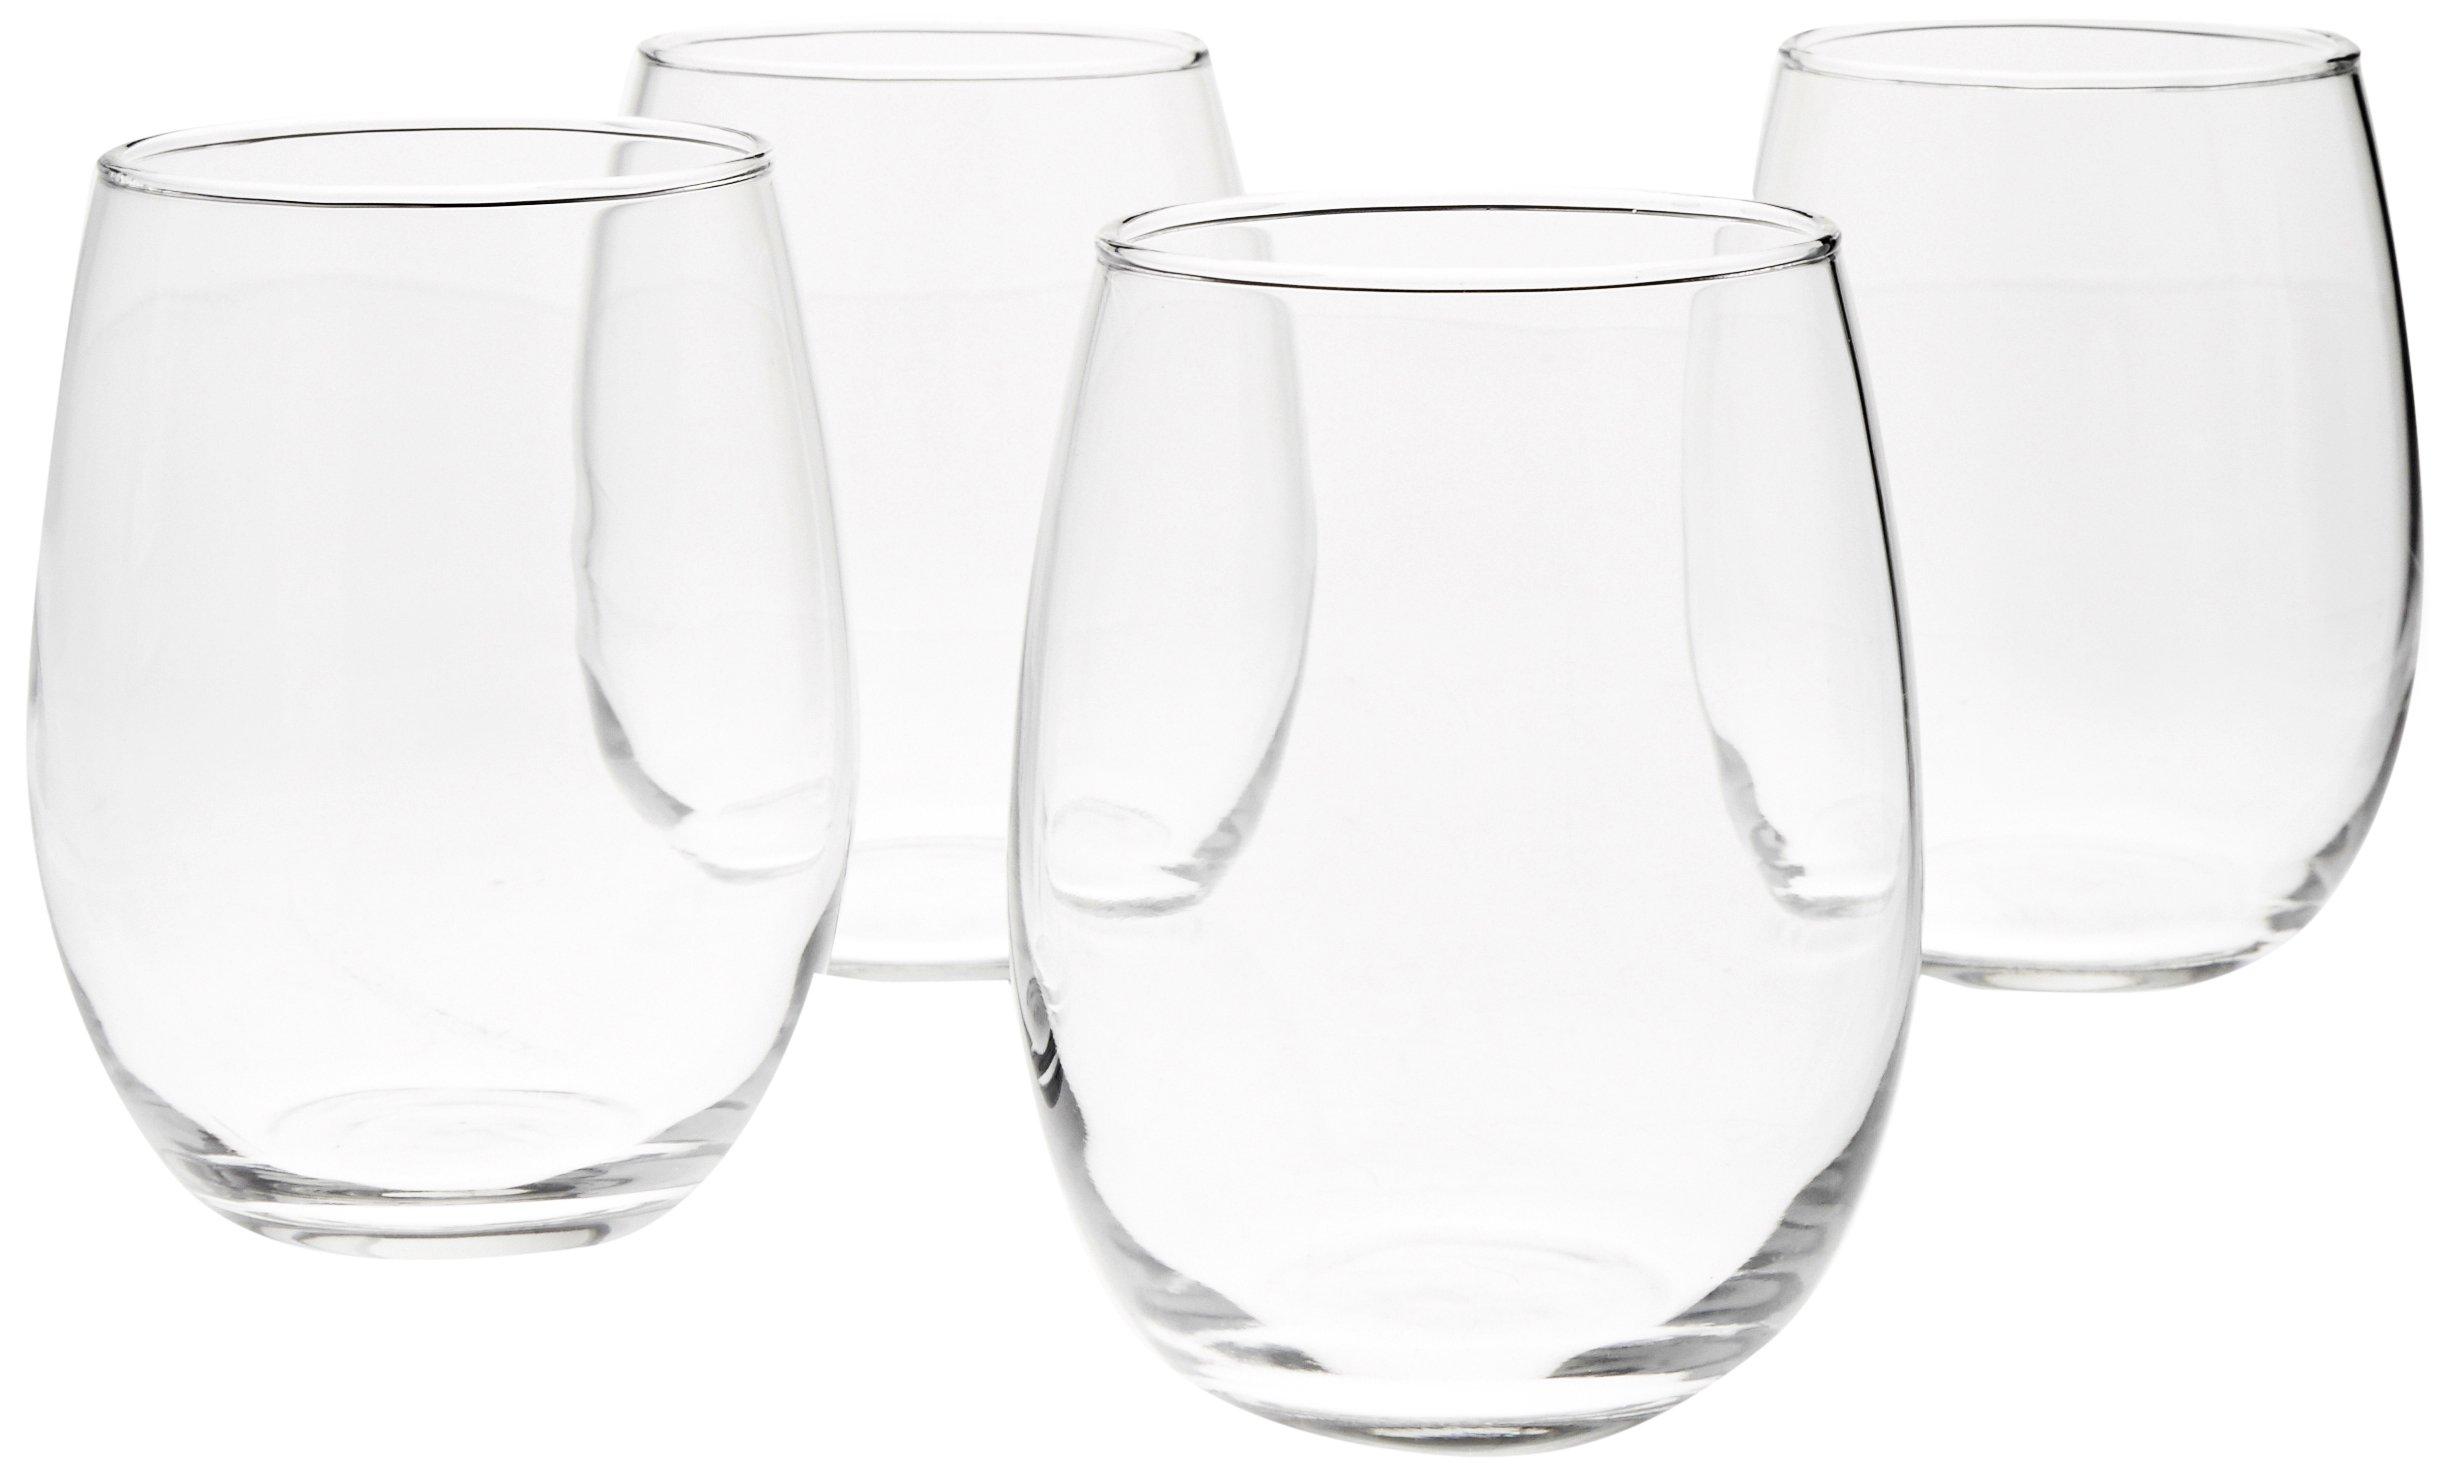 AmazonBasics Stemless Wine Glasses, 15-Ounce, Set of 4 by AmazonBasics